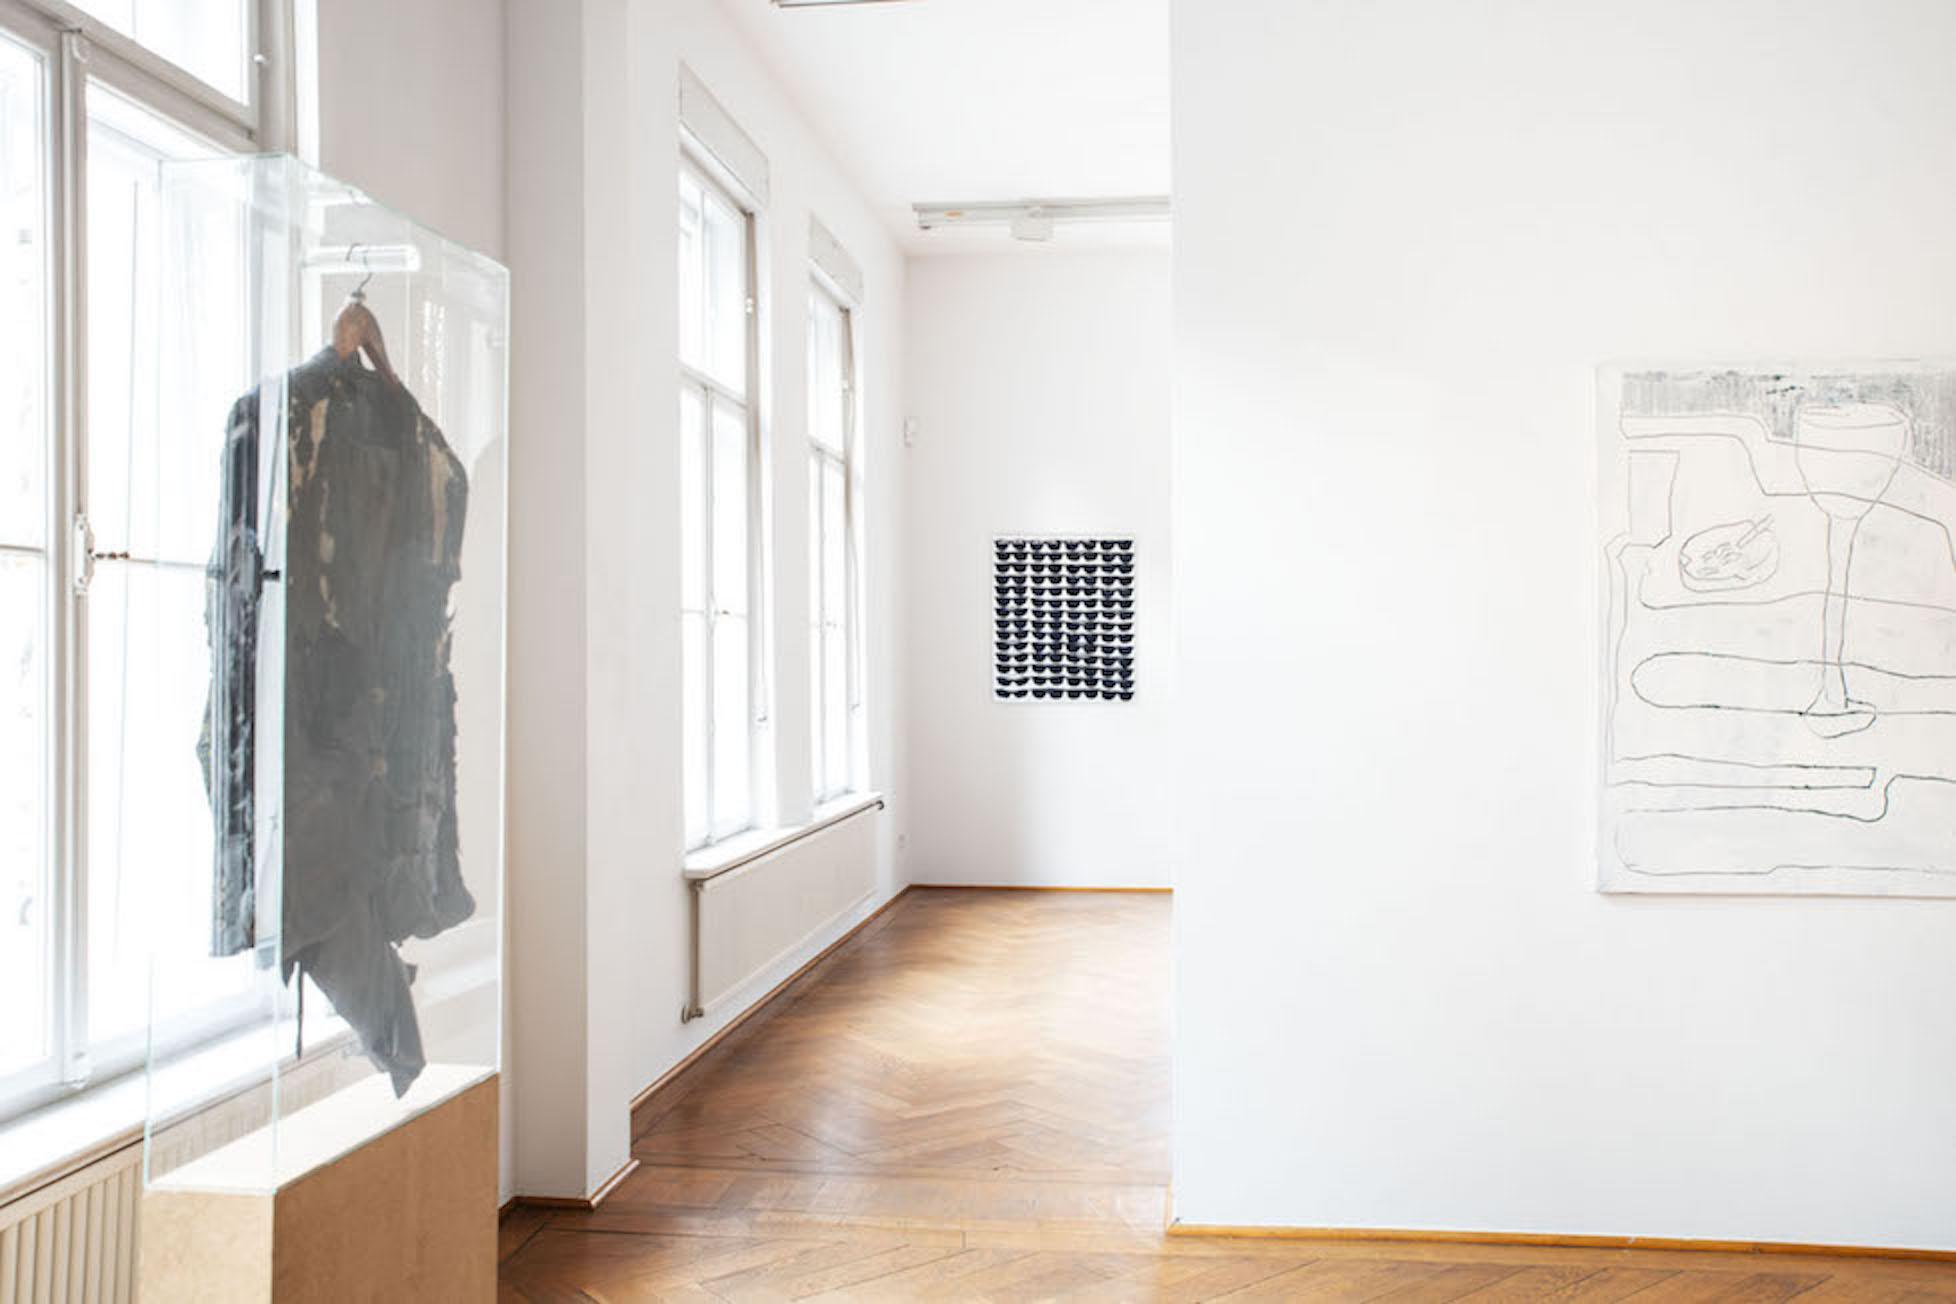 Installation view Klasse Gregor Hildebrandt